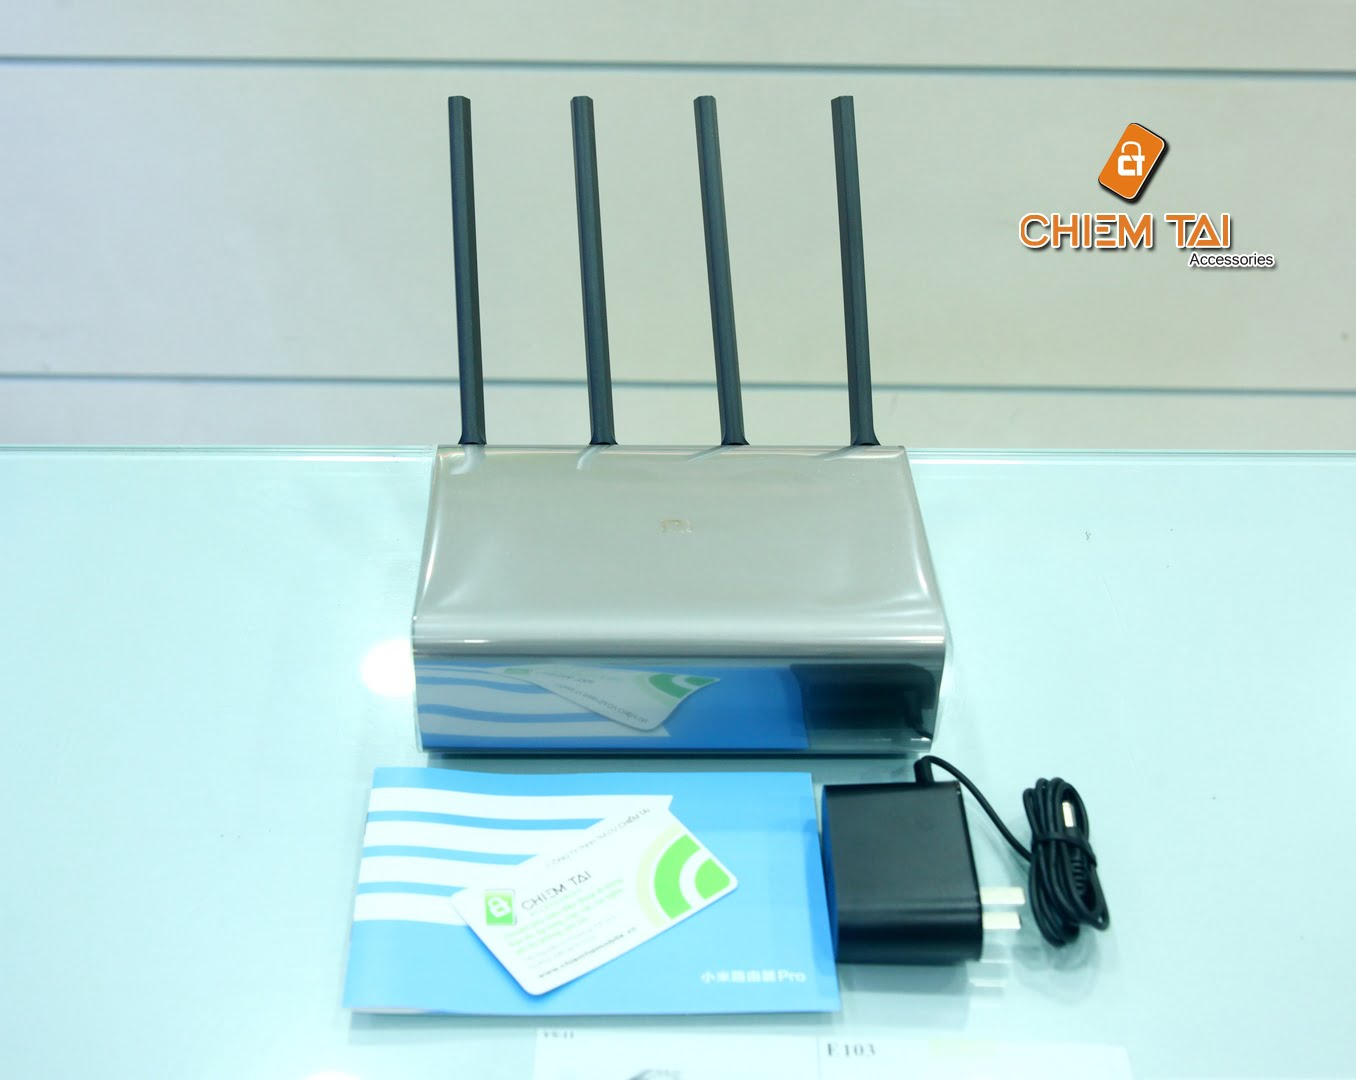 router wifi xiaomi hd 2017 tich hop o cung 1tb 6007fdea9907b